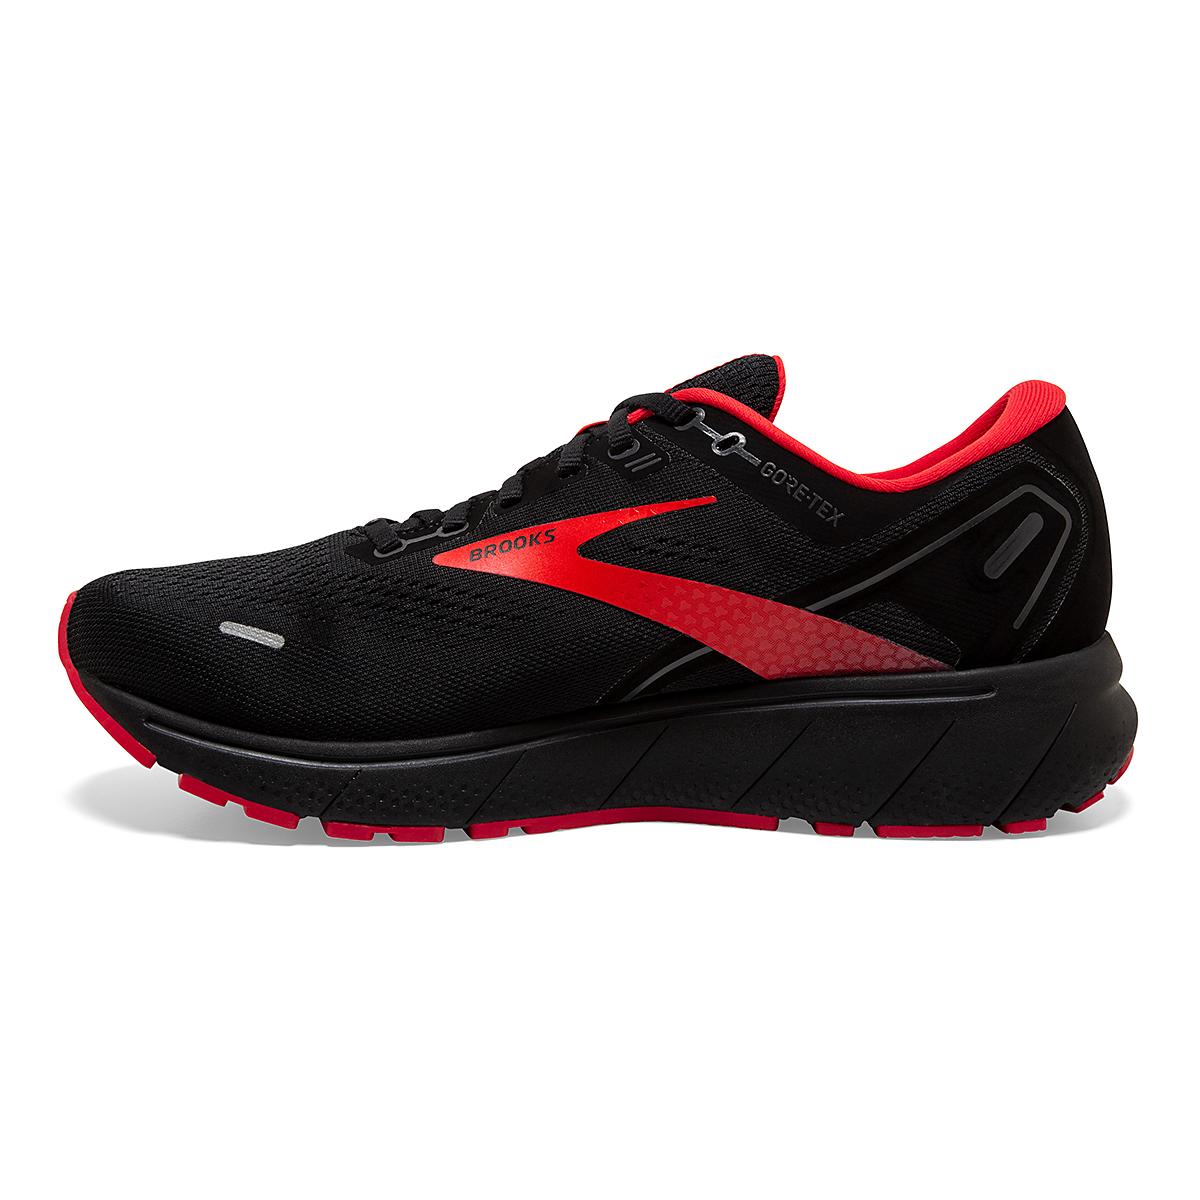 Men's Brooks Ghost 14 Gore-Tex Running Shoe - Color: Black/Blackened - Size: 7 - Width: Regular, Black/Blackened, large, image 2